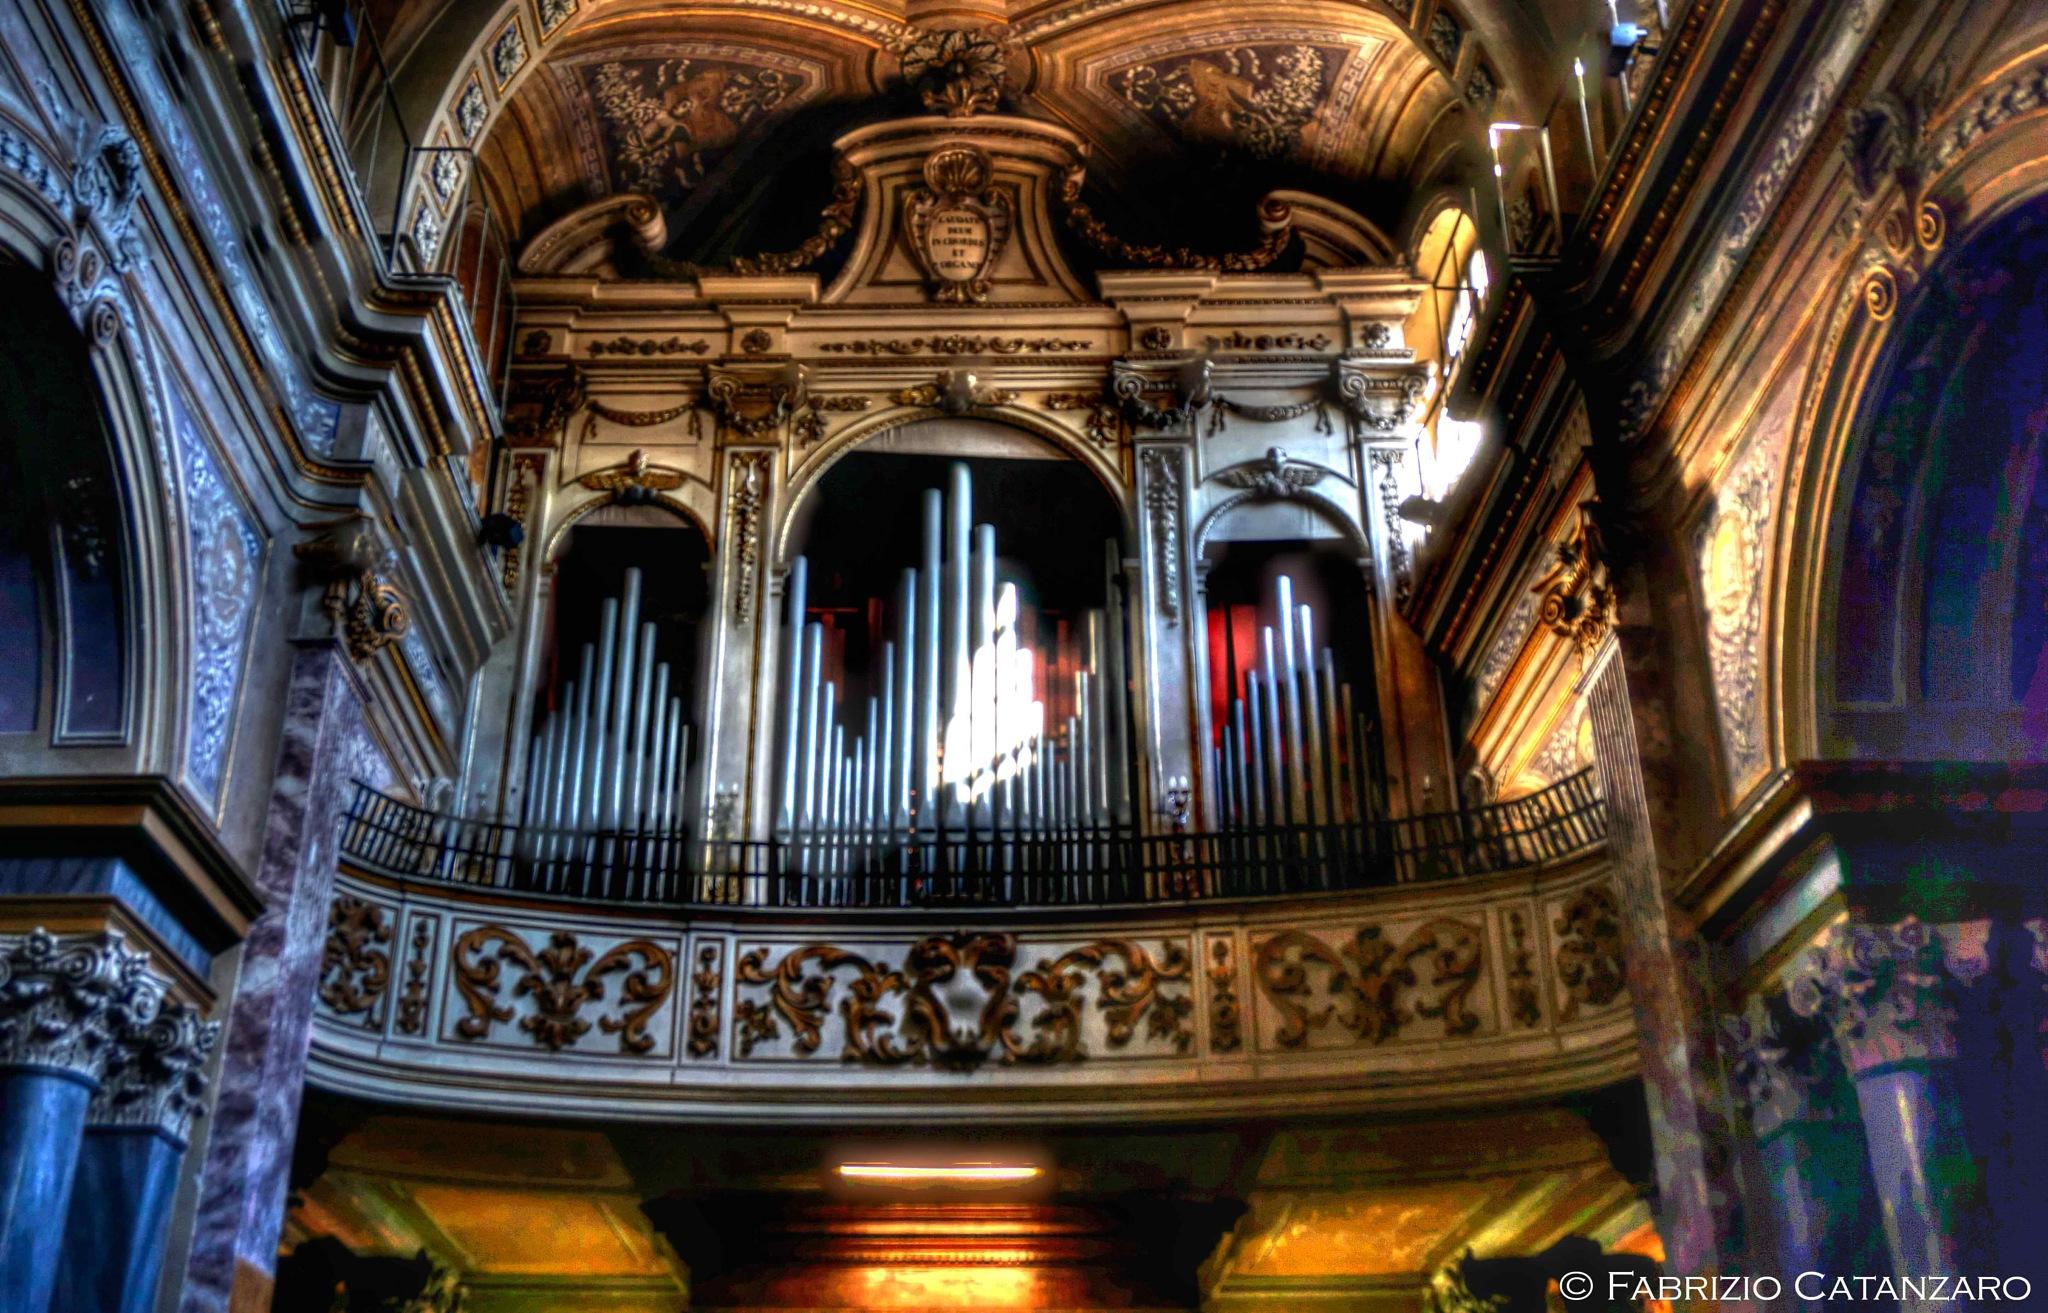 The organ of the Santa Maria Assunta cathedral by fabricata